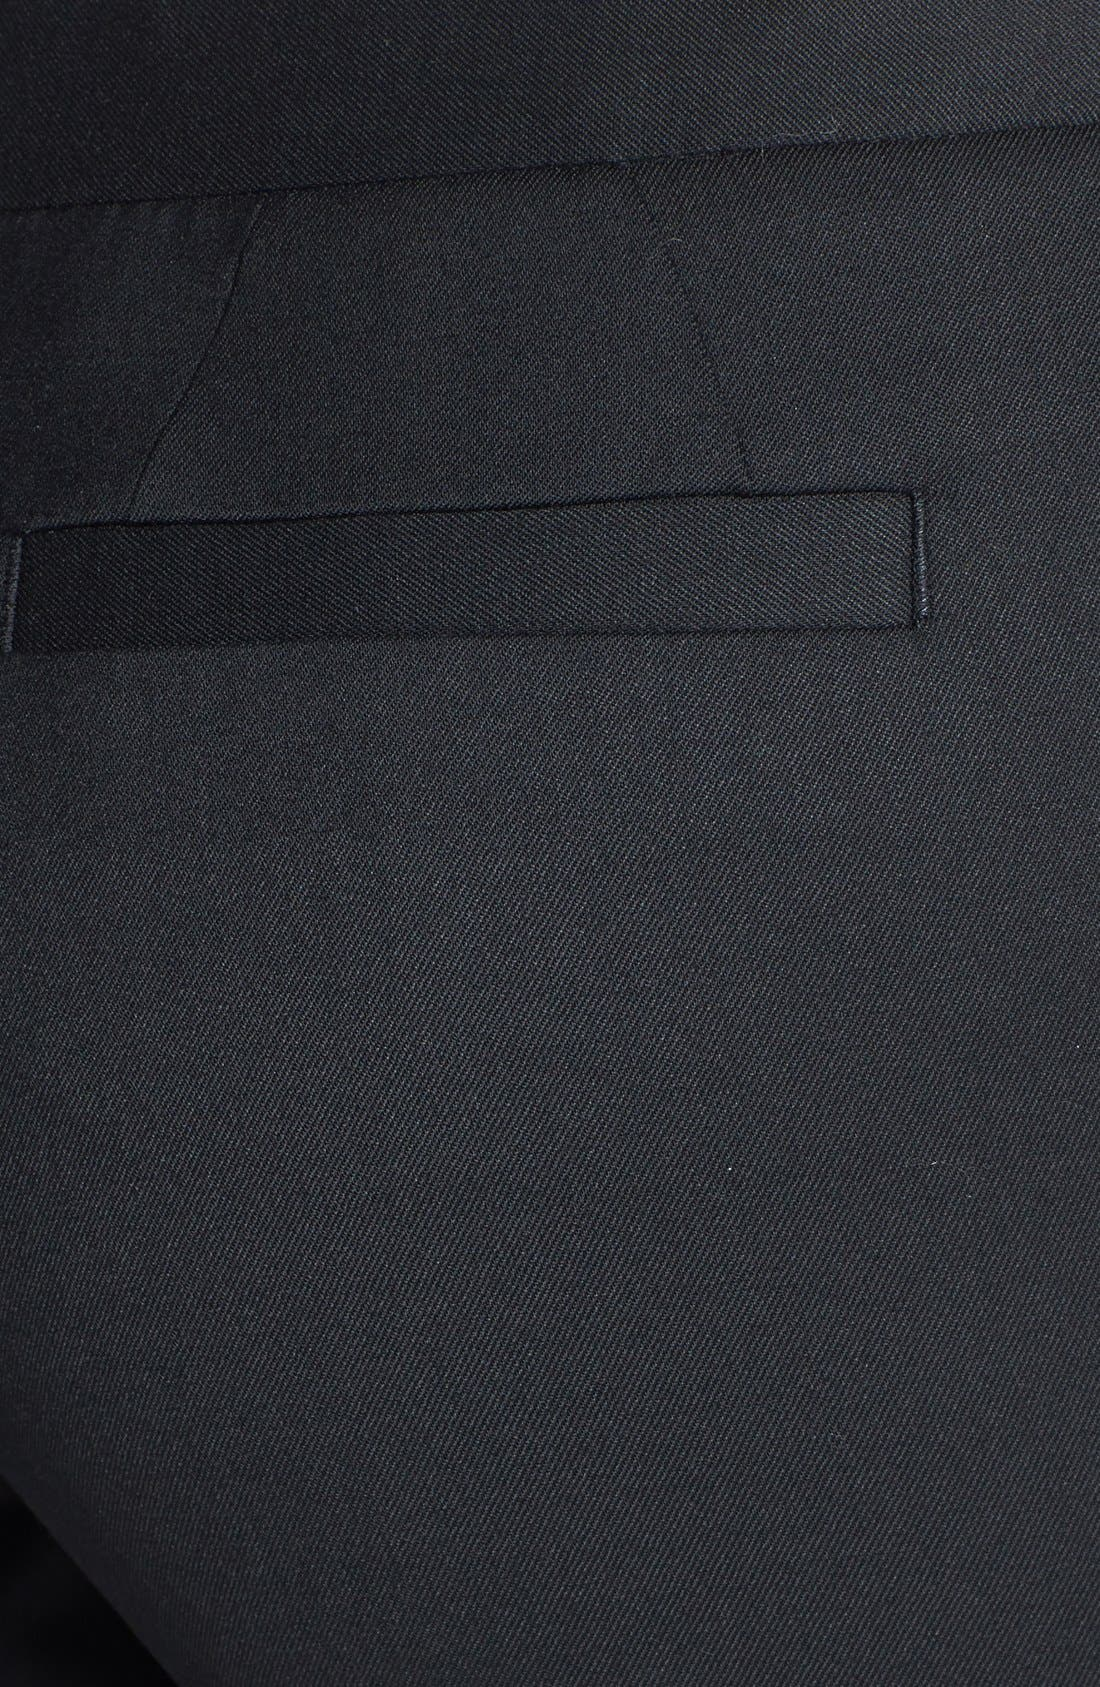 Alternate Image 3  - Ted Baker London Slim Leg Stretch Trousers